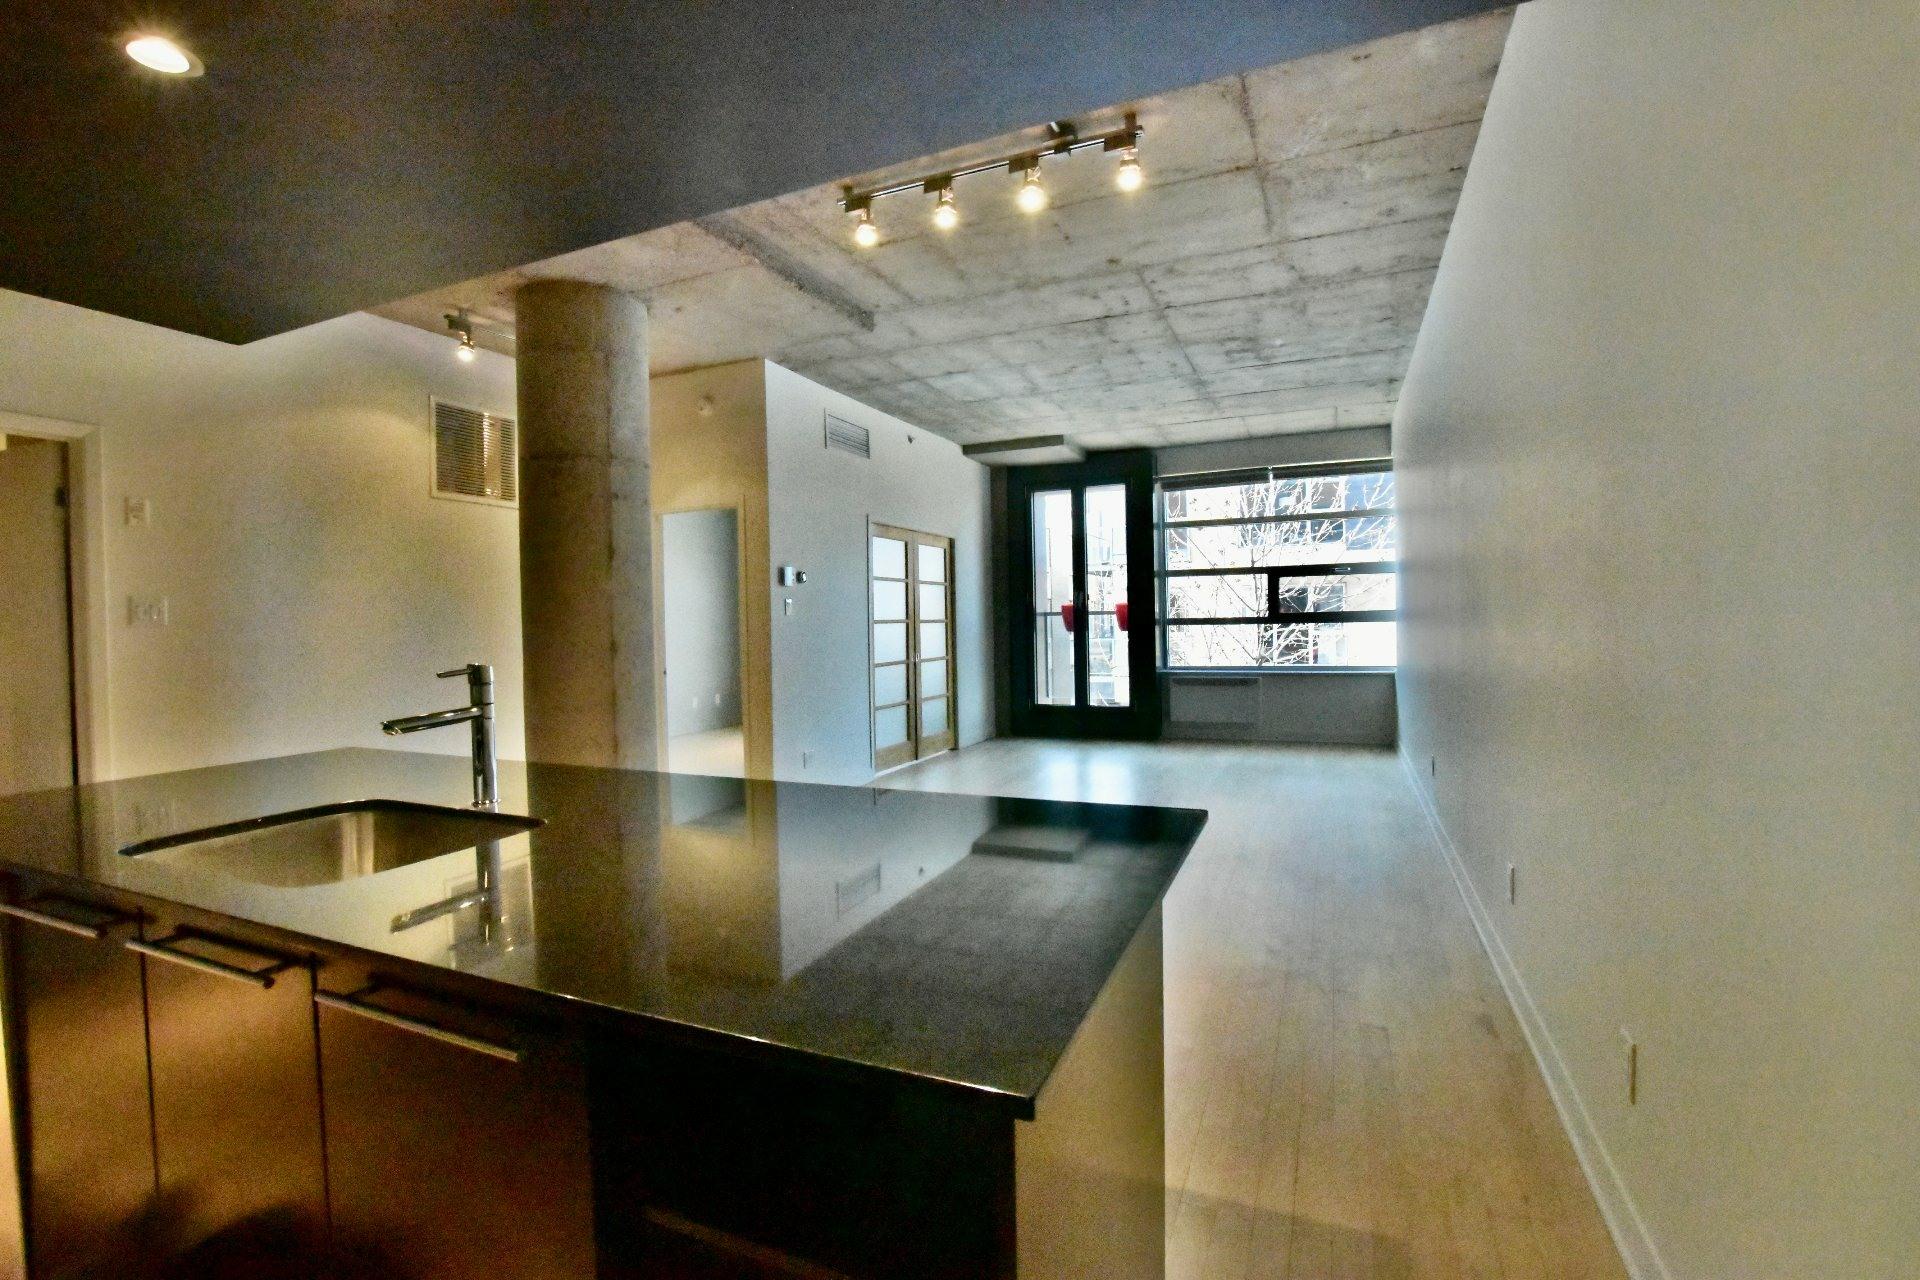 image 13 - Departamento Para alquiler Villeray/Saint-Michel/Parc-Extension Montréal  - 3 habitaciones